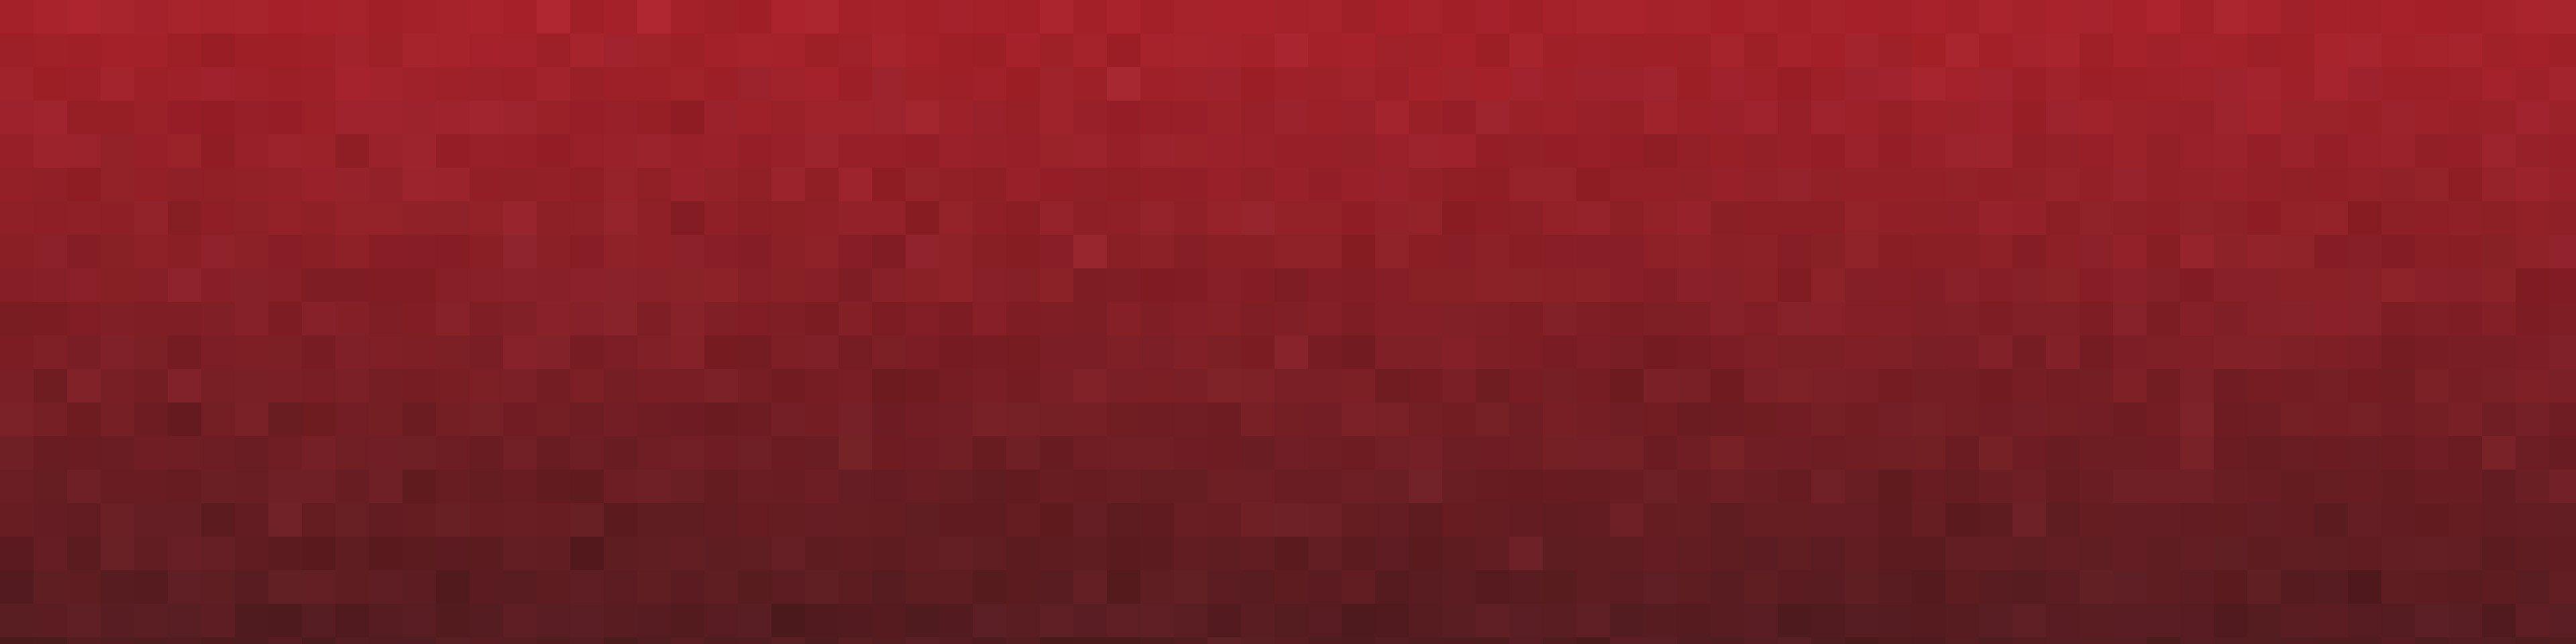 Digital Pixelation